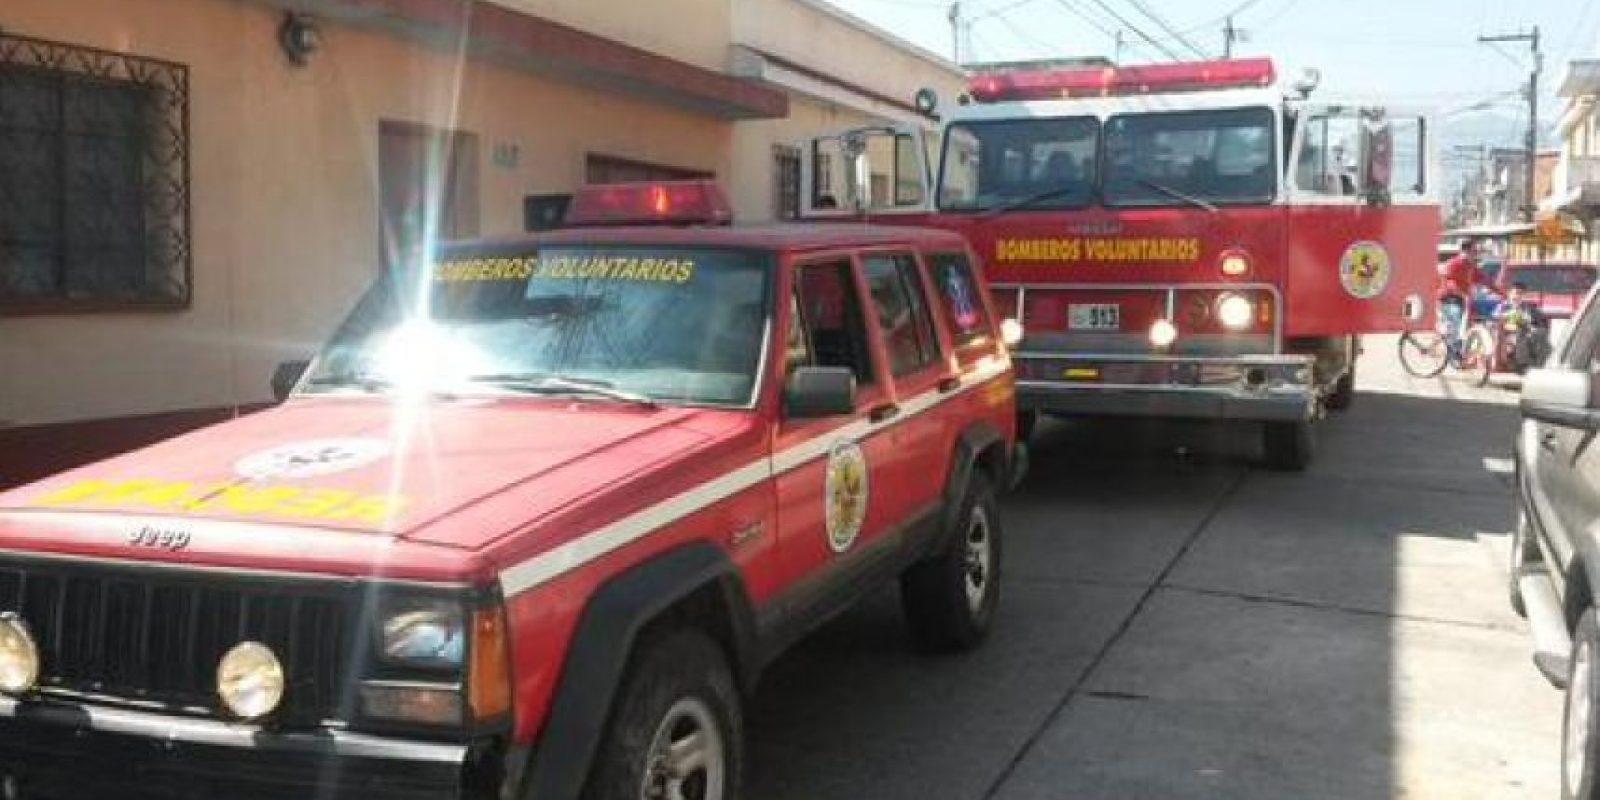 El incendio ocurrió en la colonia La Florida. Foto:CVB